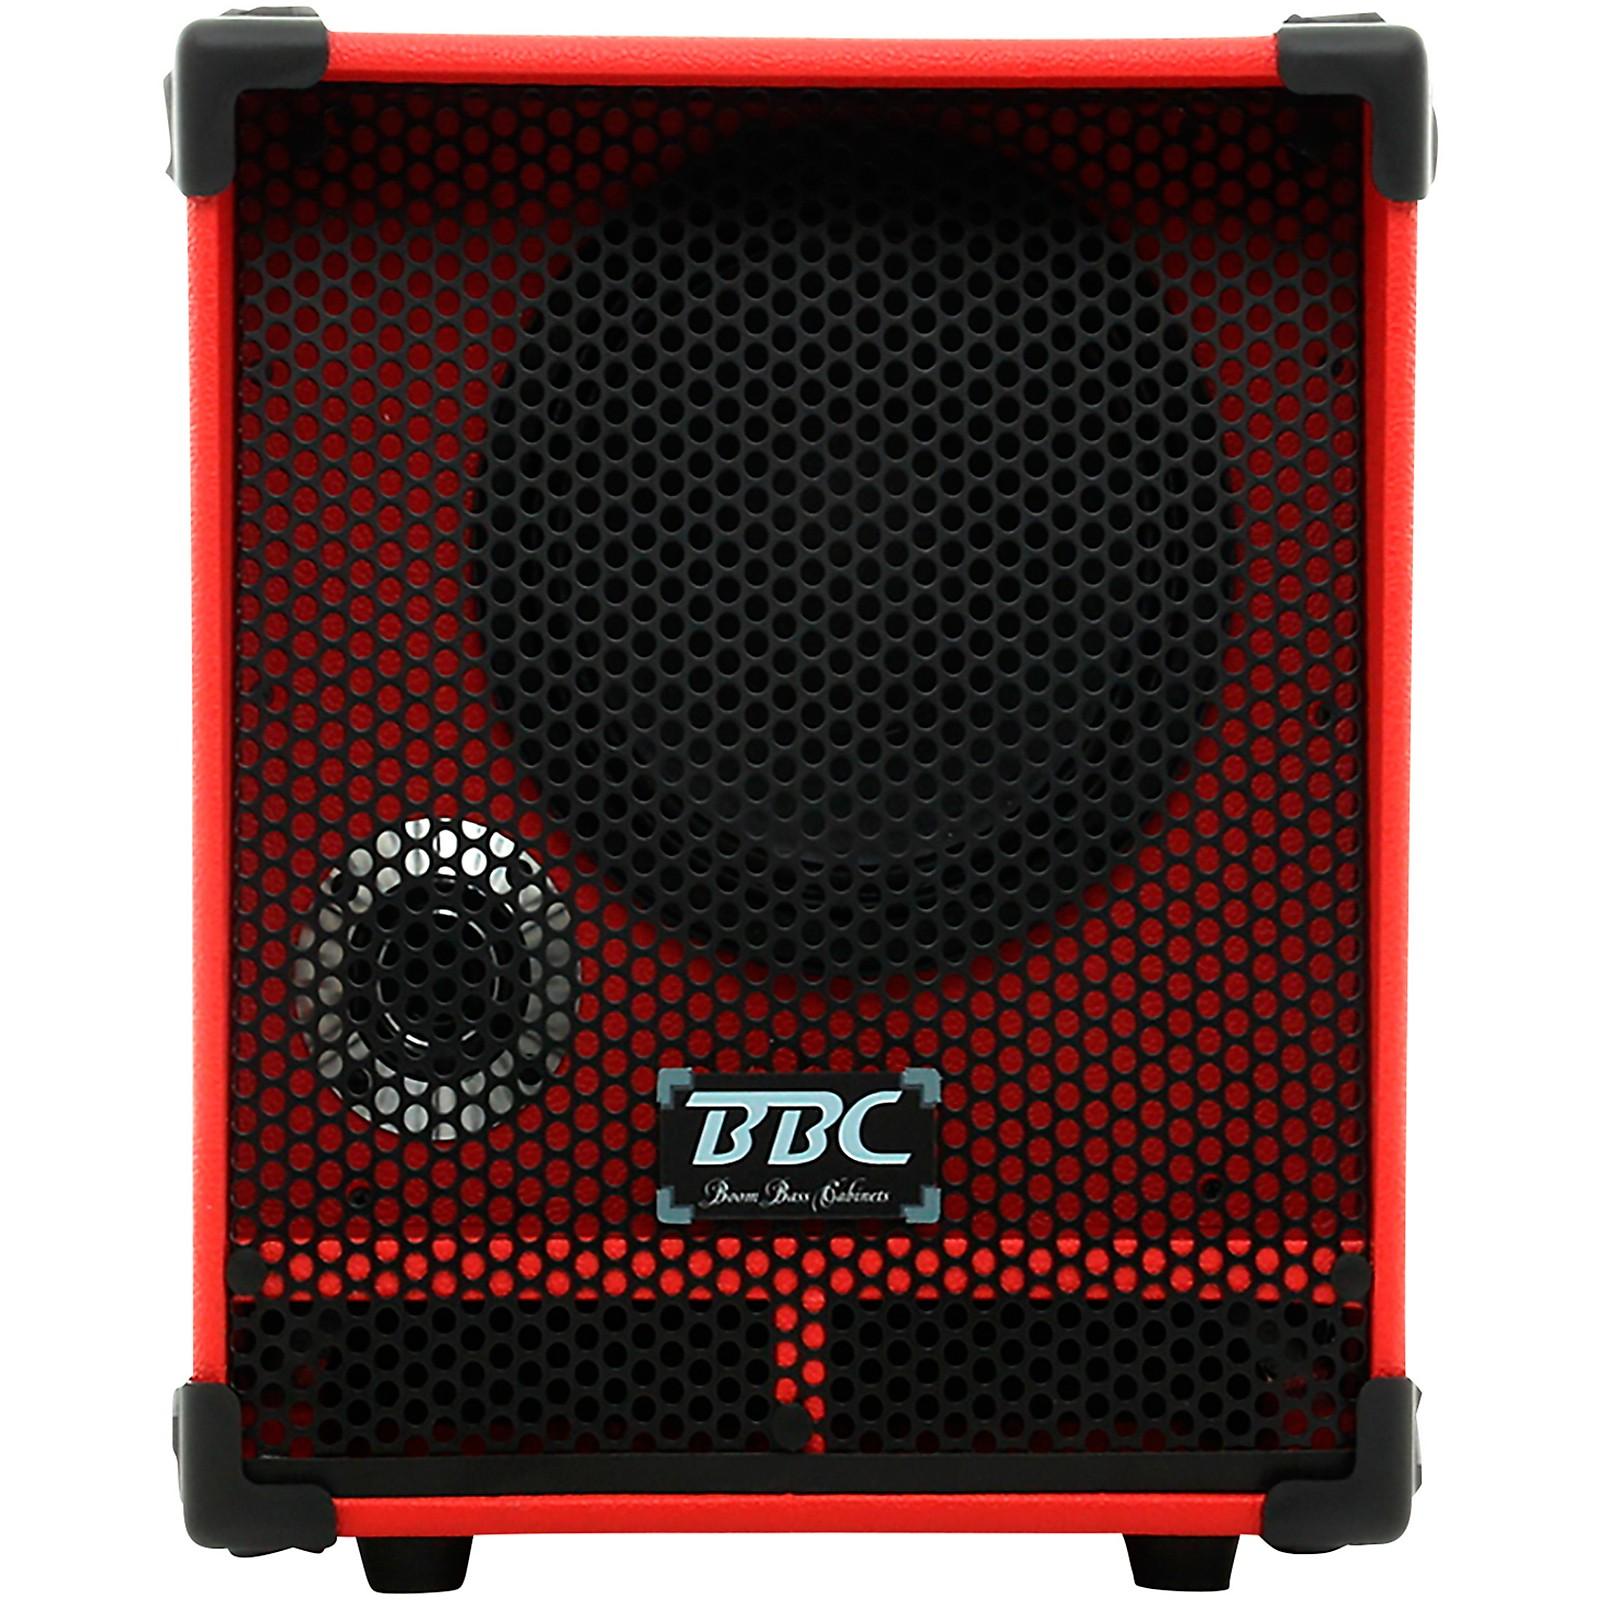 Boom Bass Cabinets Tank 1212 1,200W 2x12 Bass Speaker Cabinets